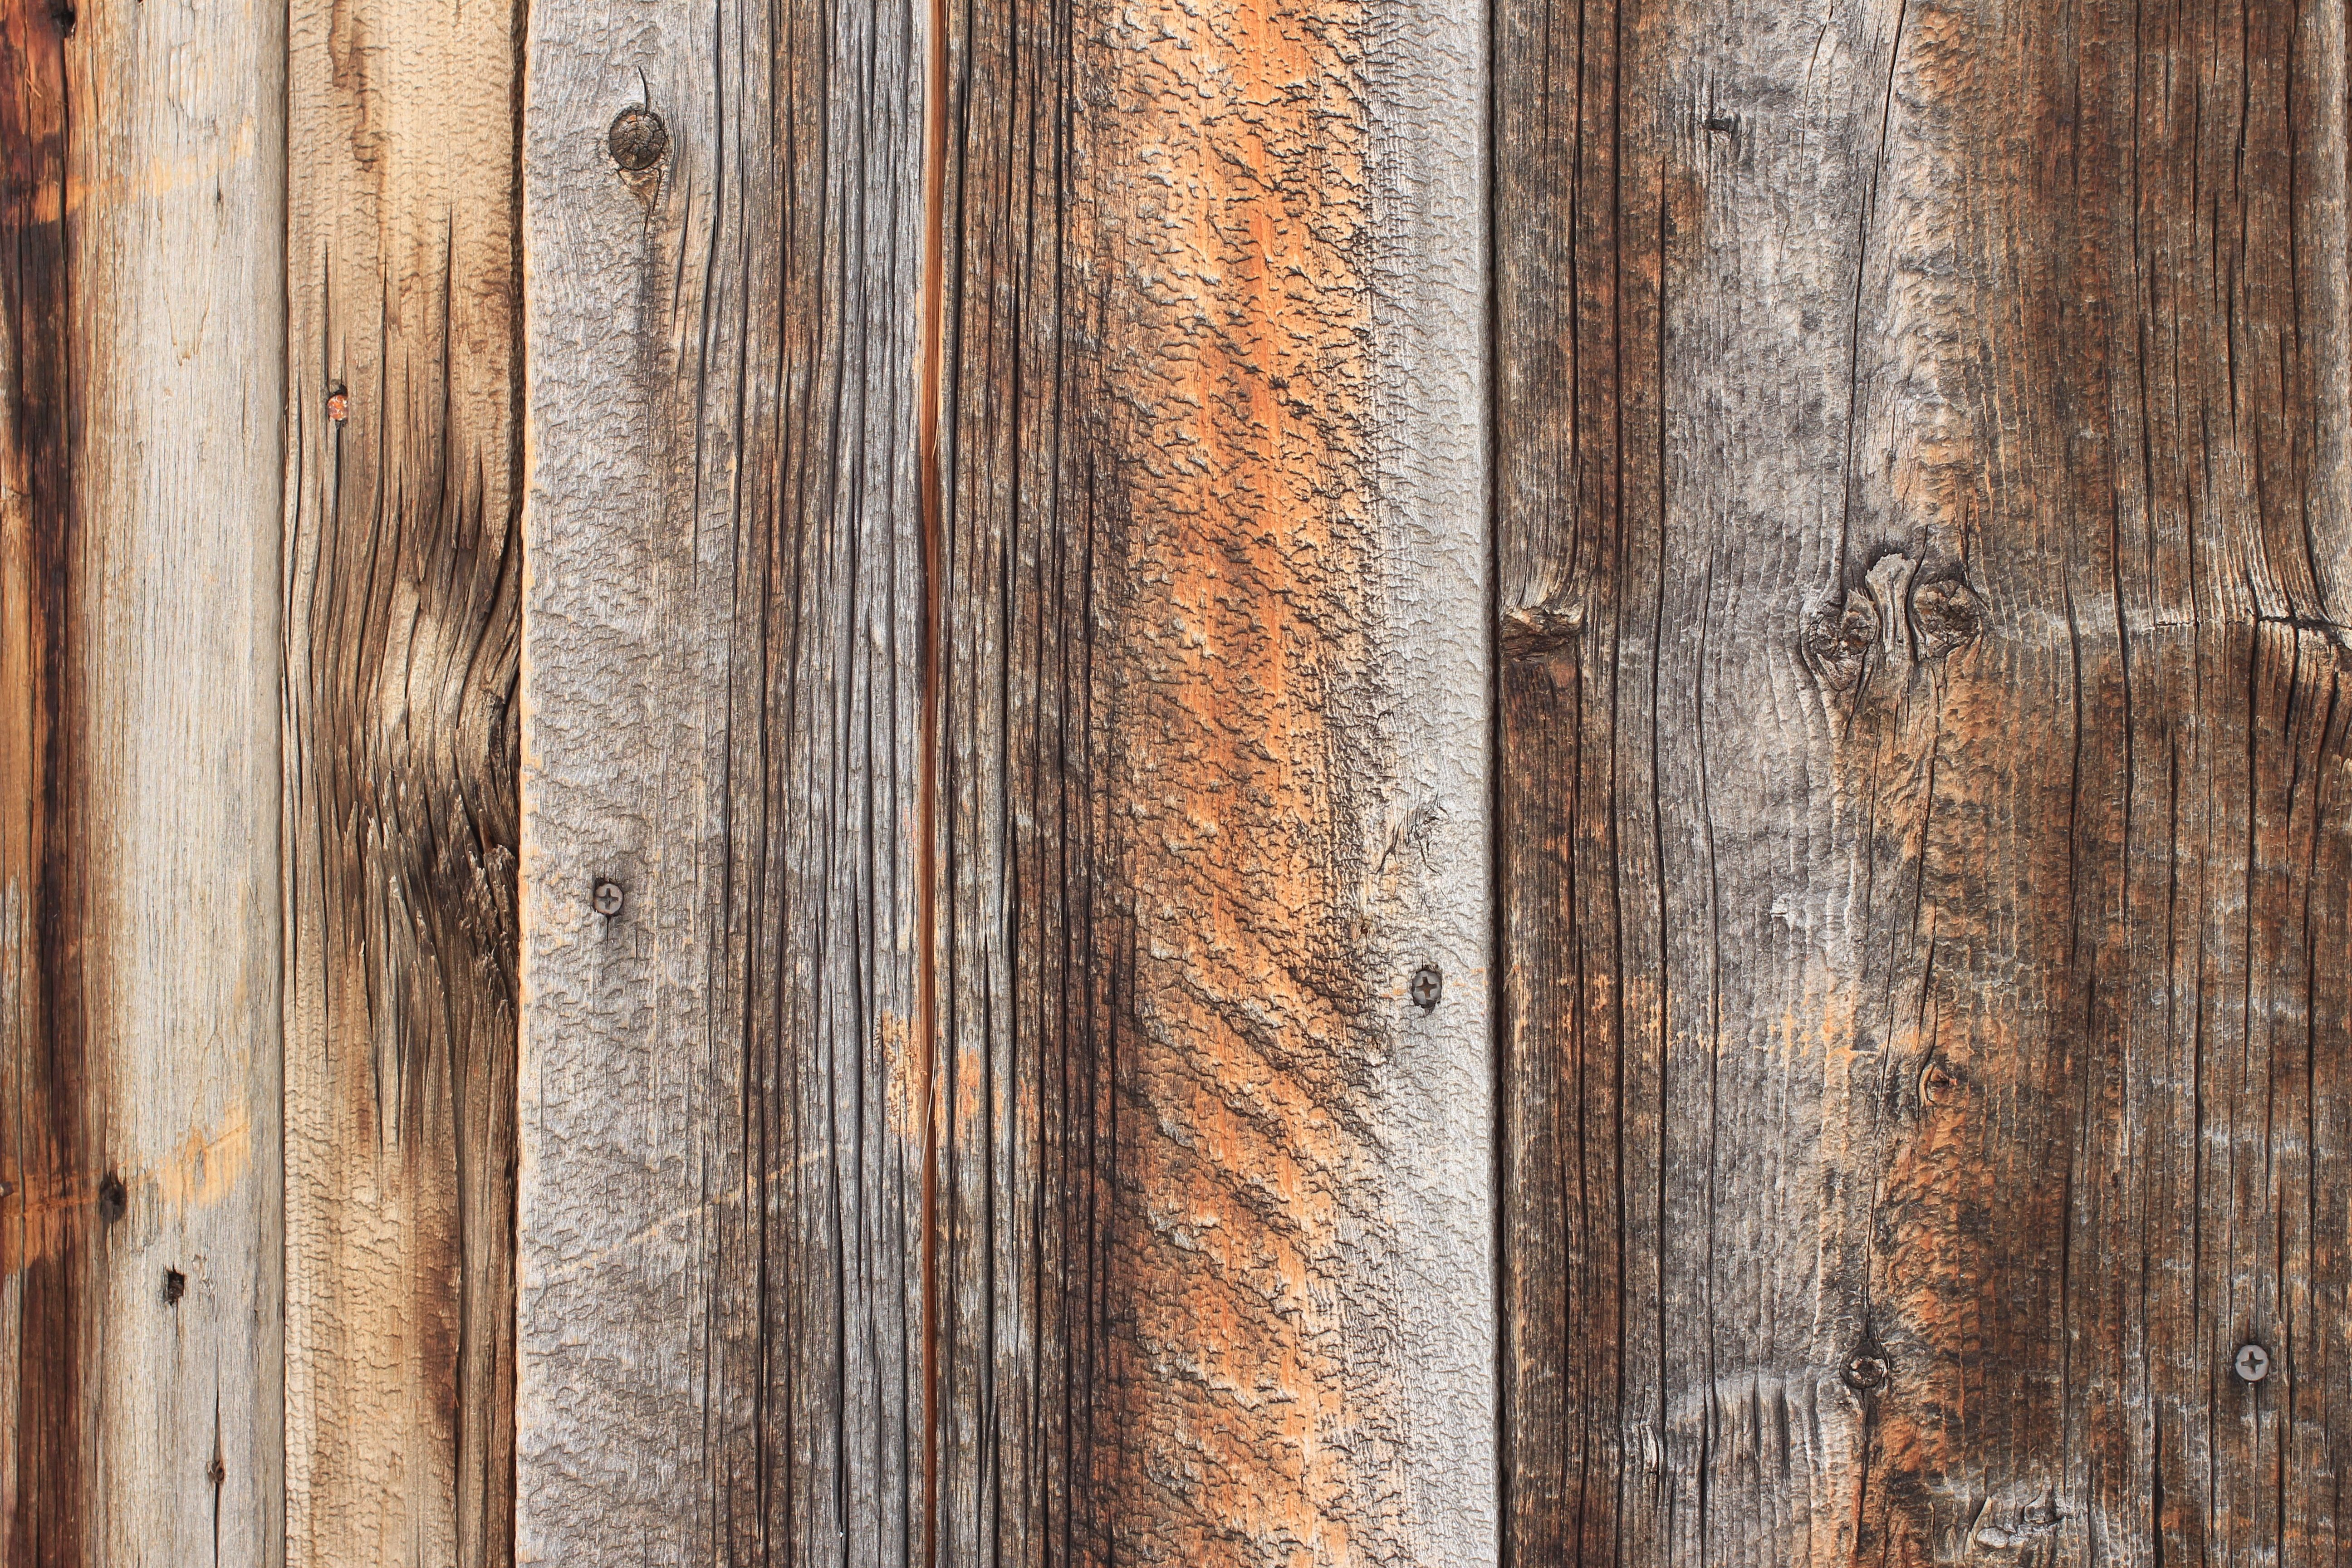 15 Pics Review Rustic Floor Ideas Near Me And Description